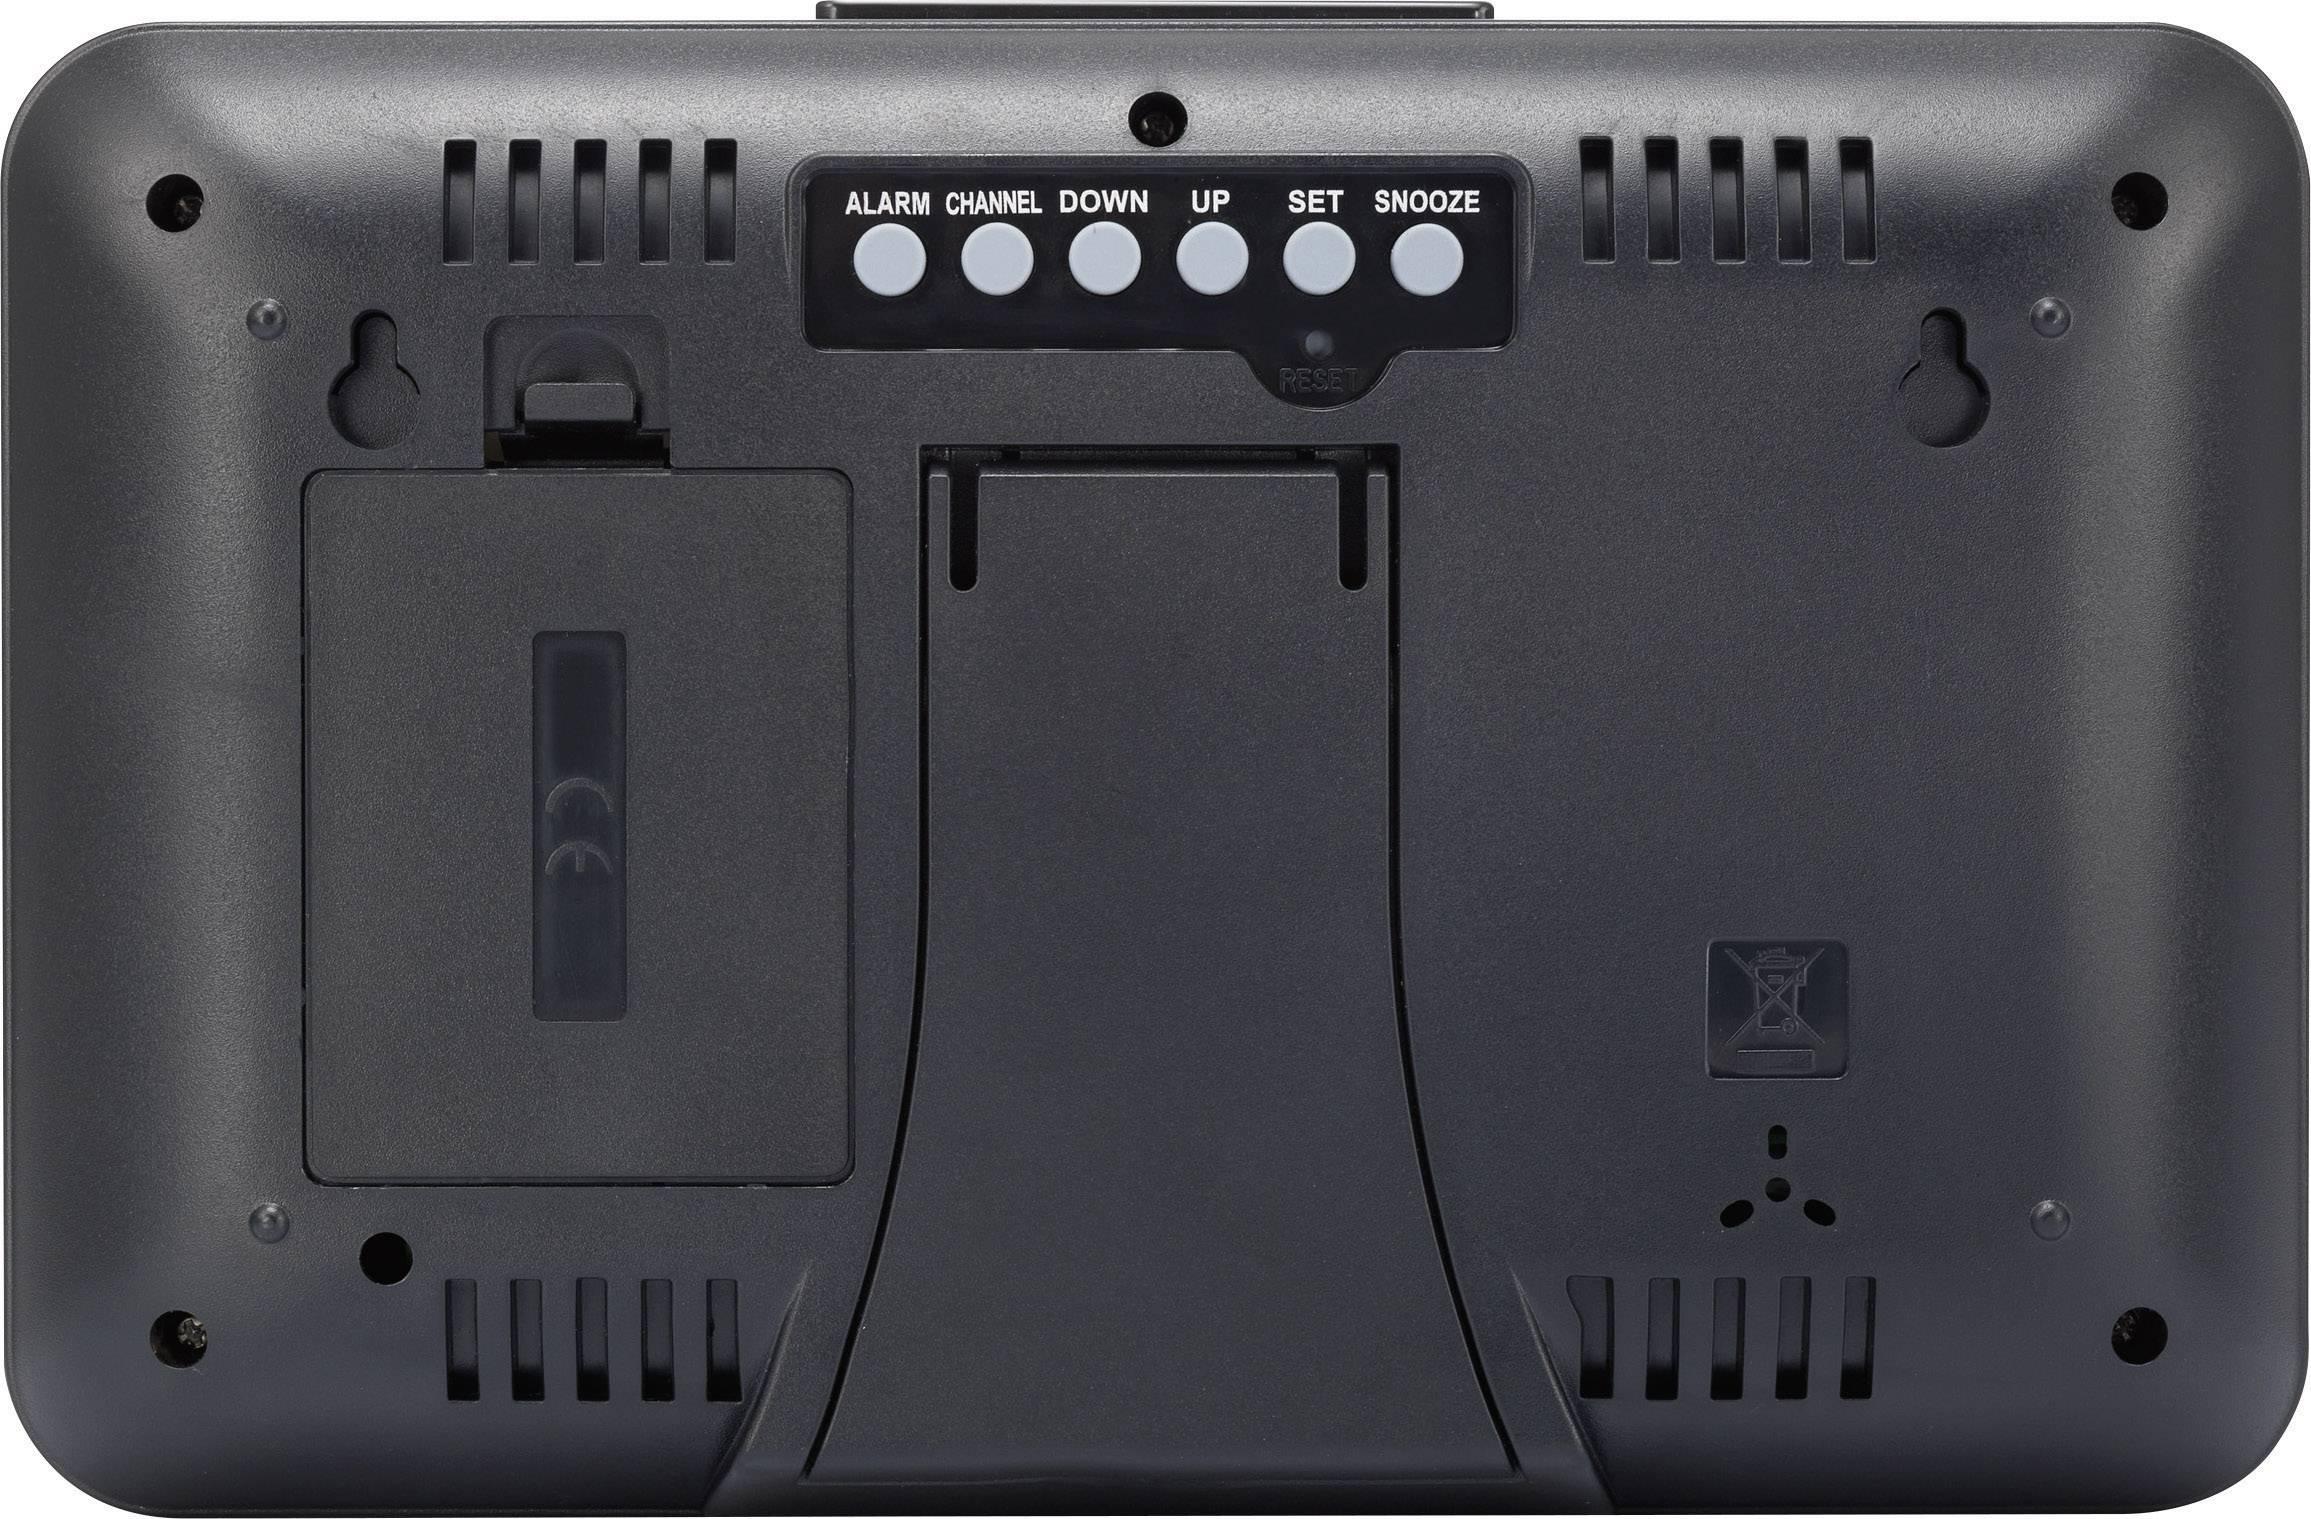 Digitálna bezdrôtová meteostanica Renkforce max. dosah 30 m